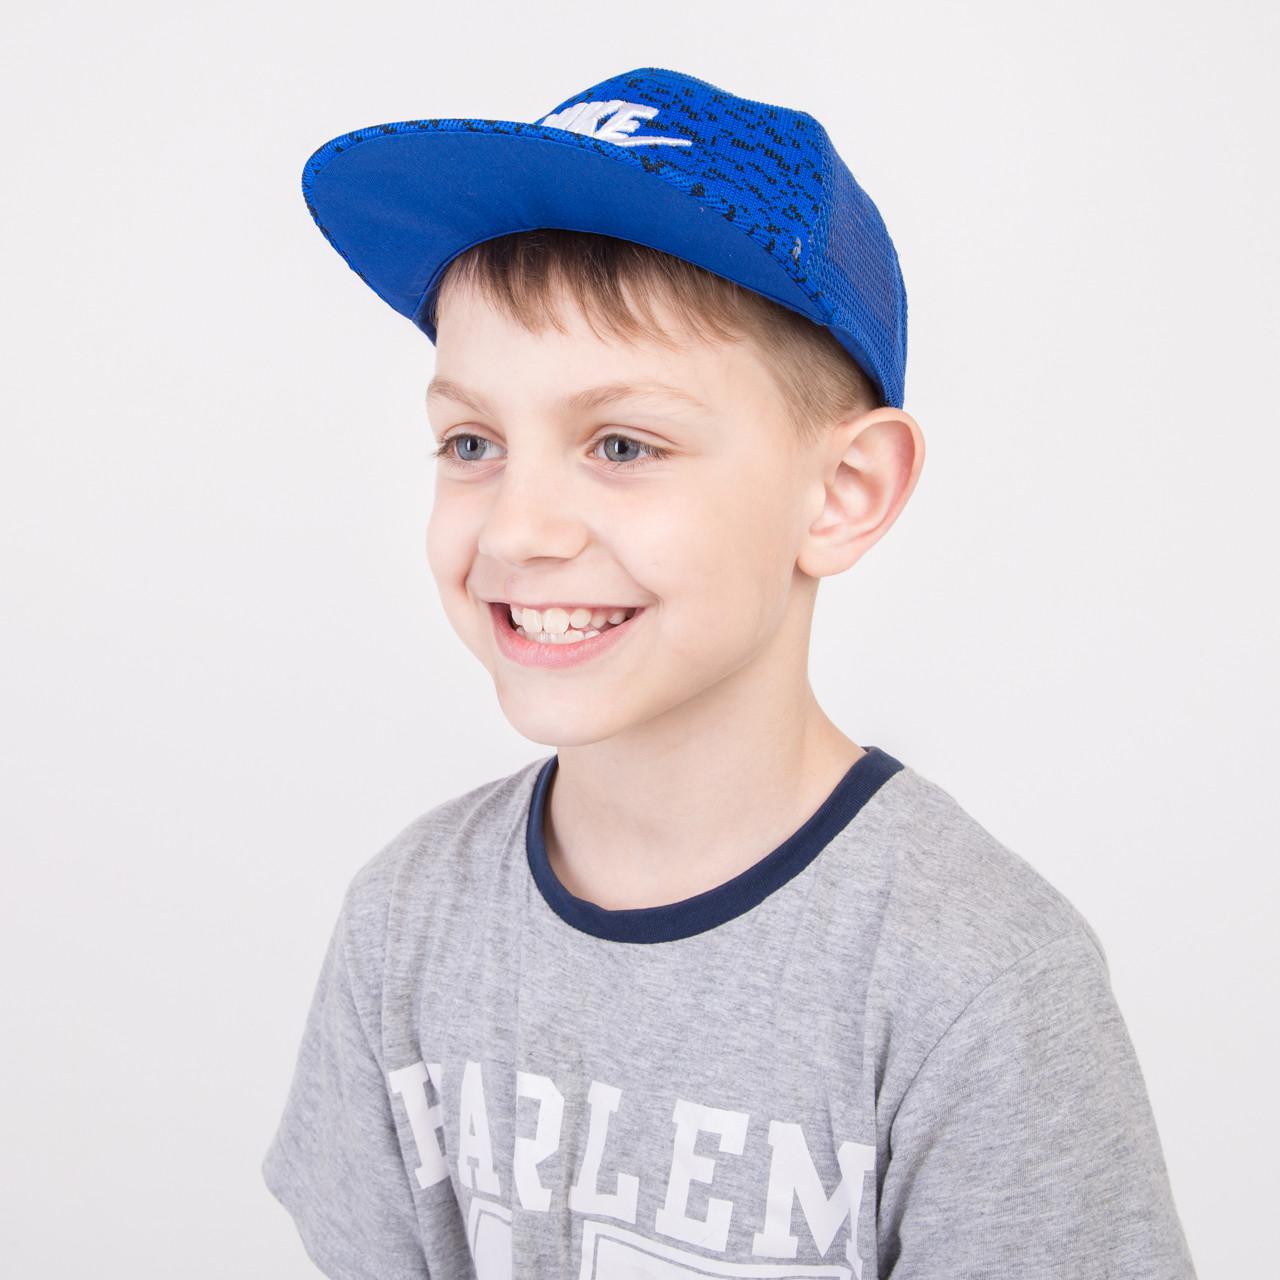 Кепка Snapback на лето для мальчика оптом - Nike (реплика) - 82018-15